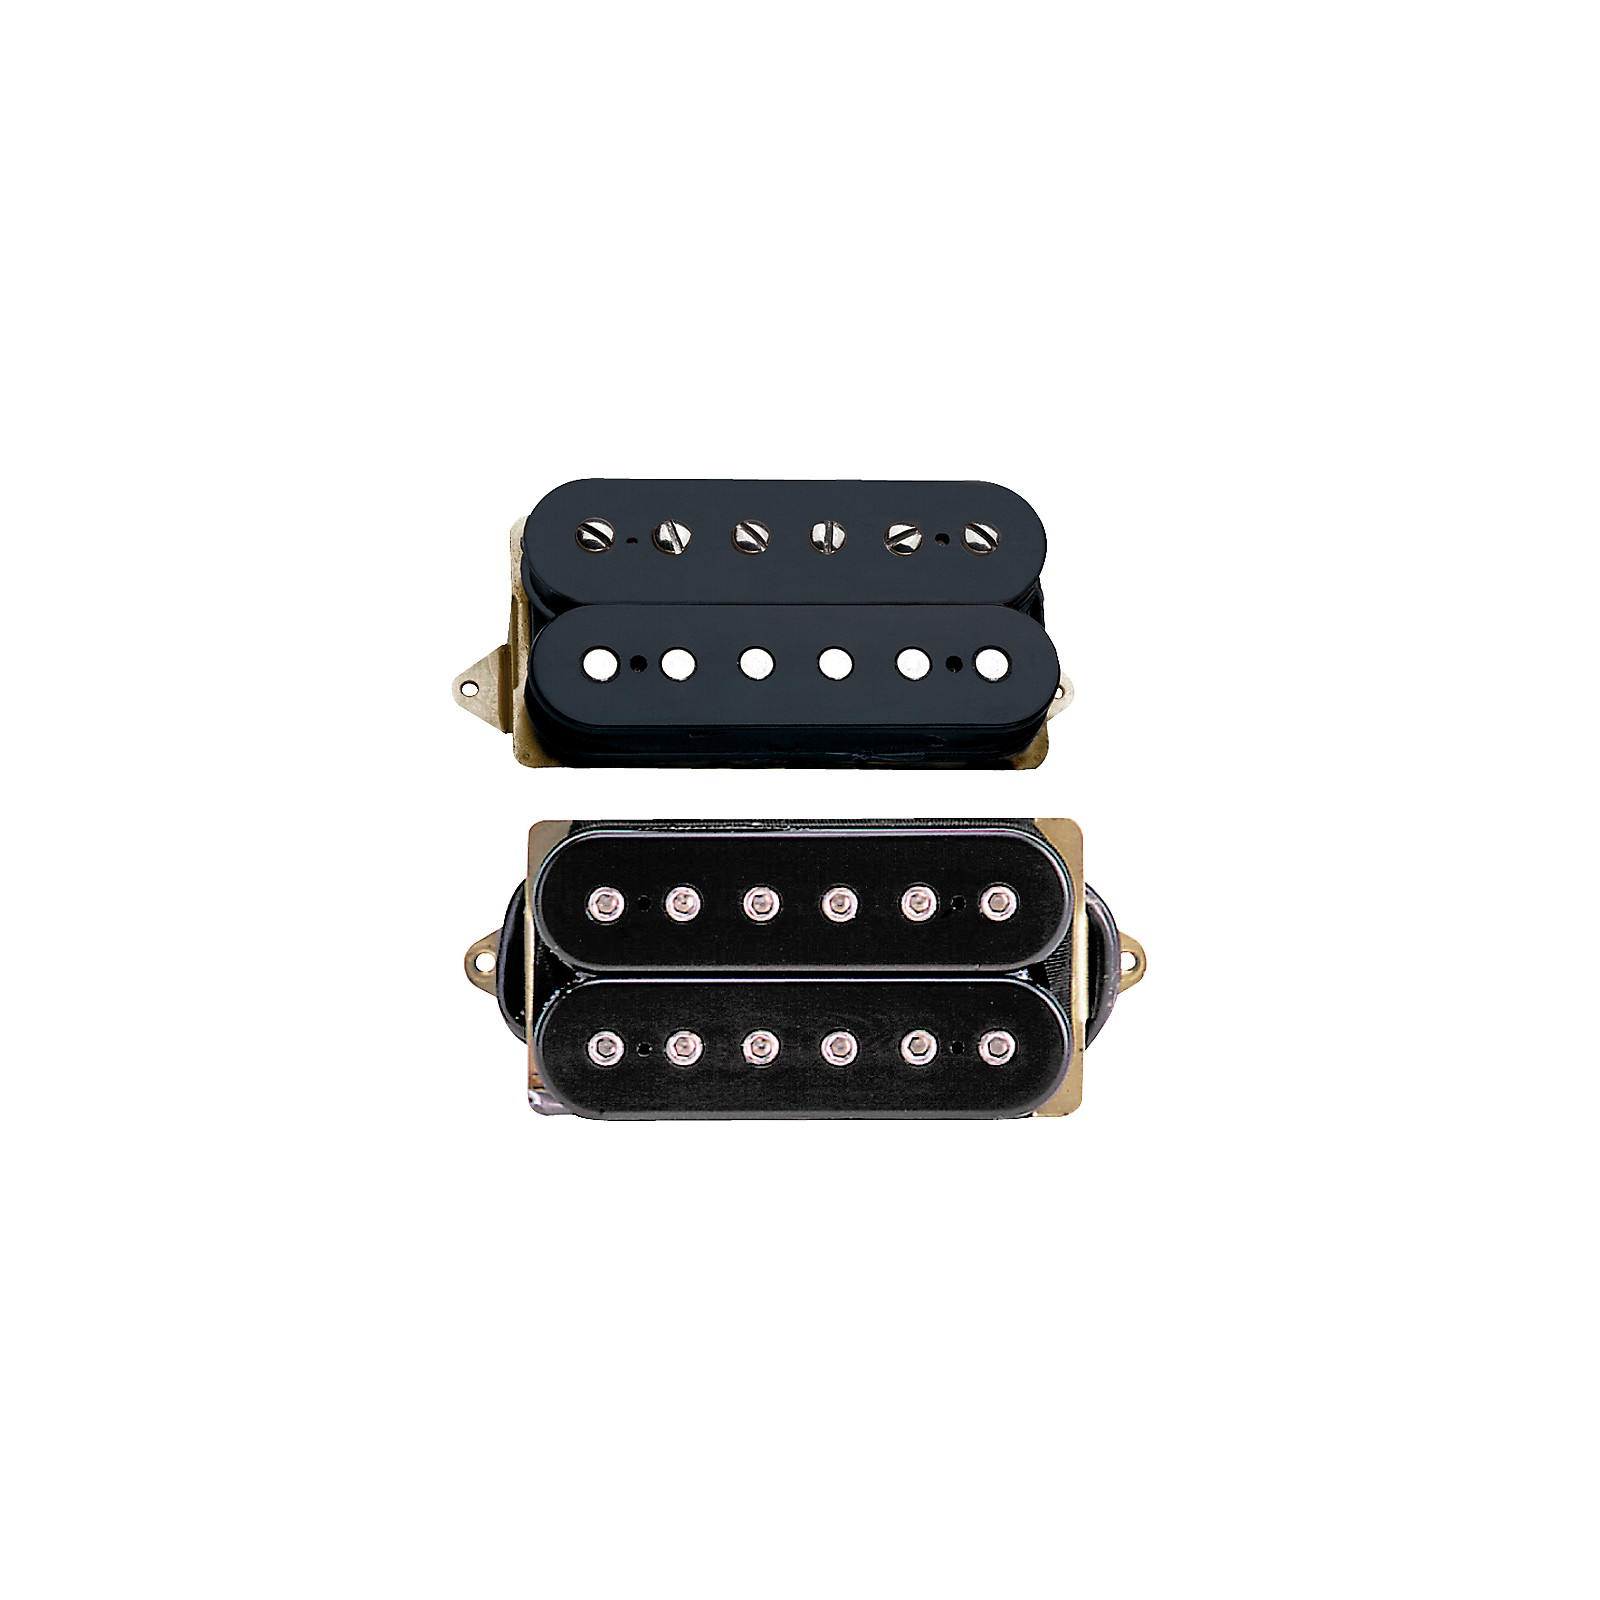 DiMarzio Classic Rock Humbucker Set